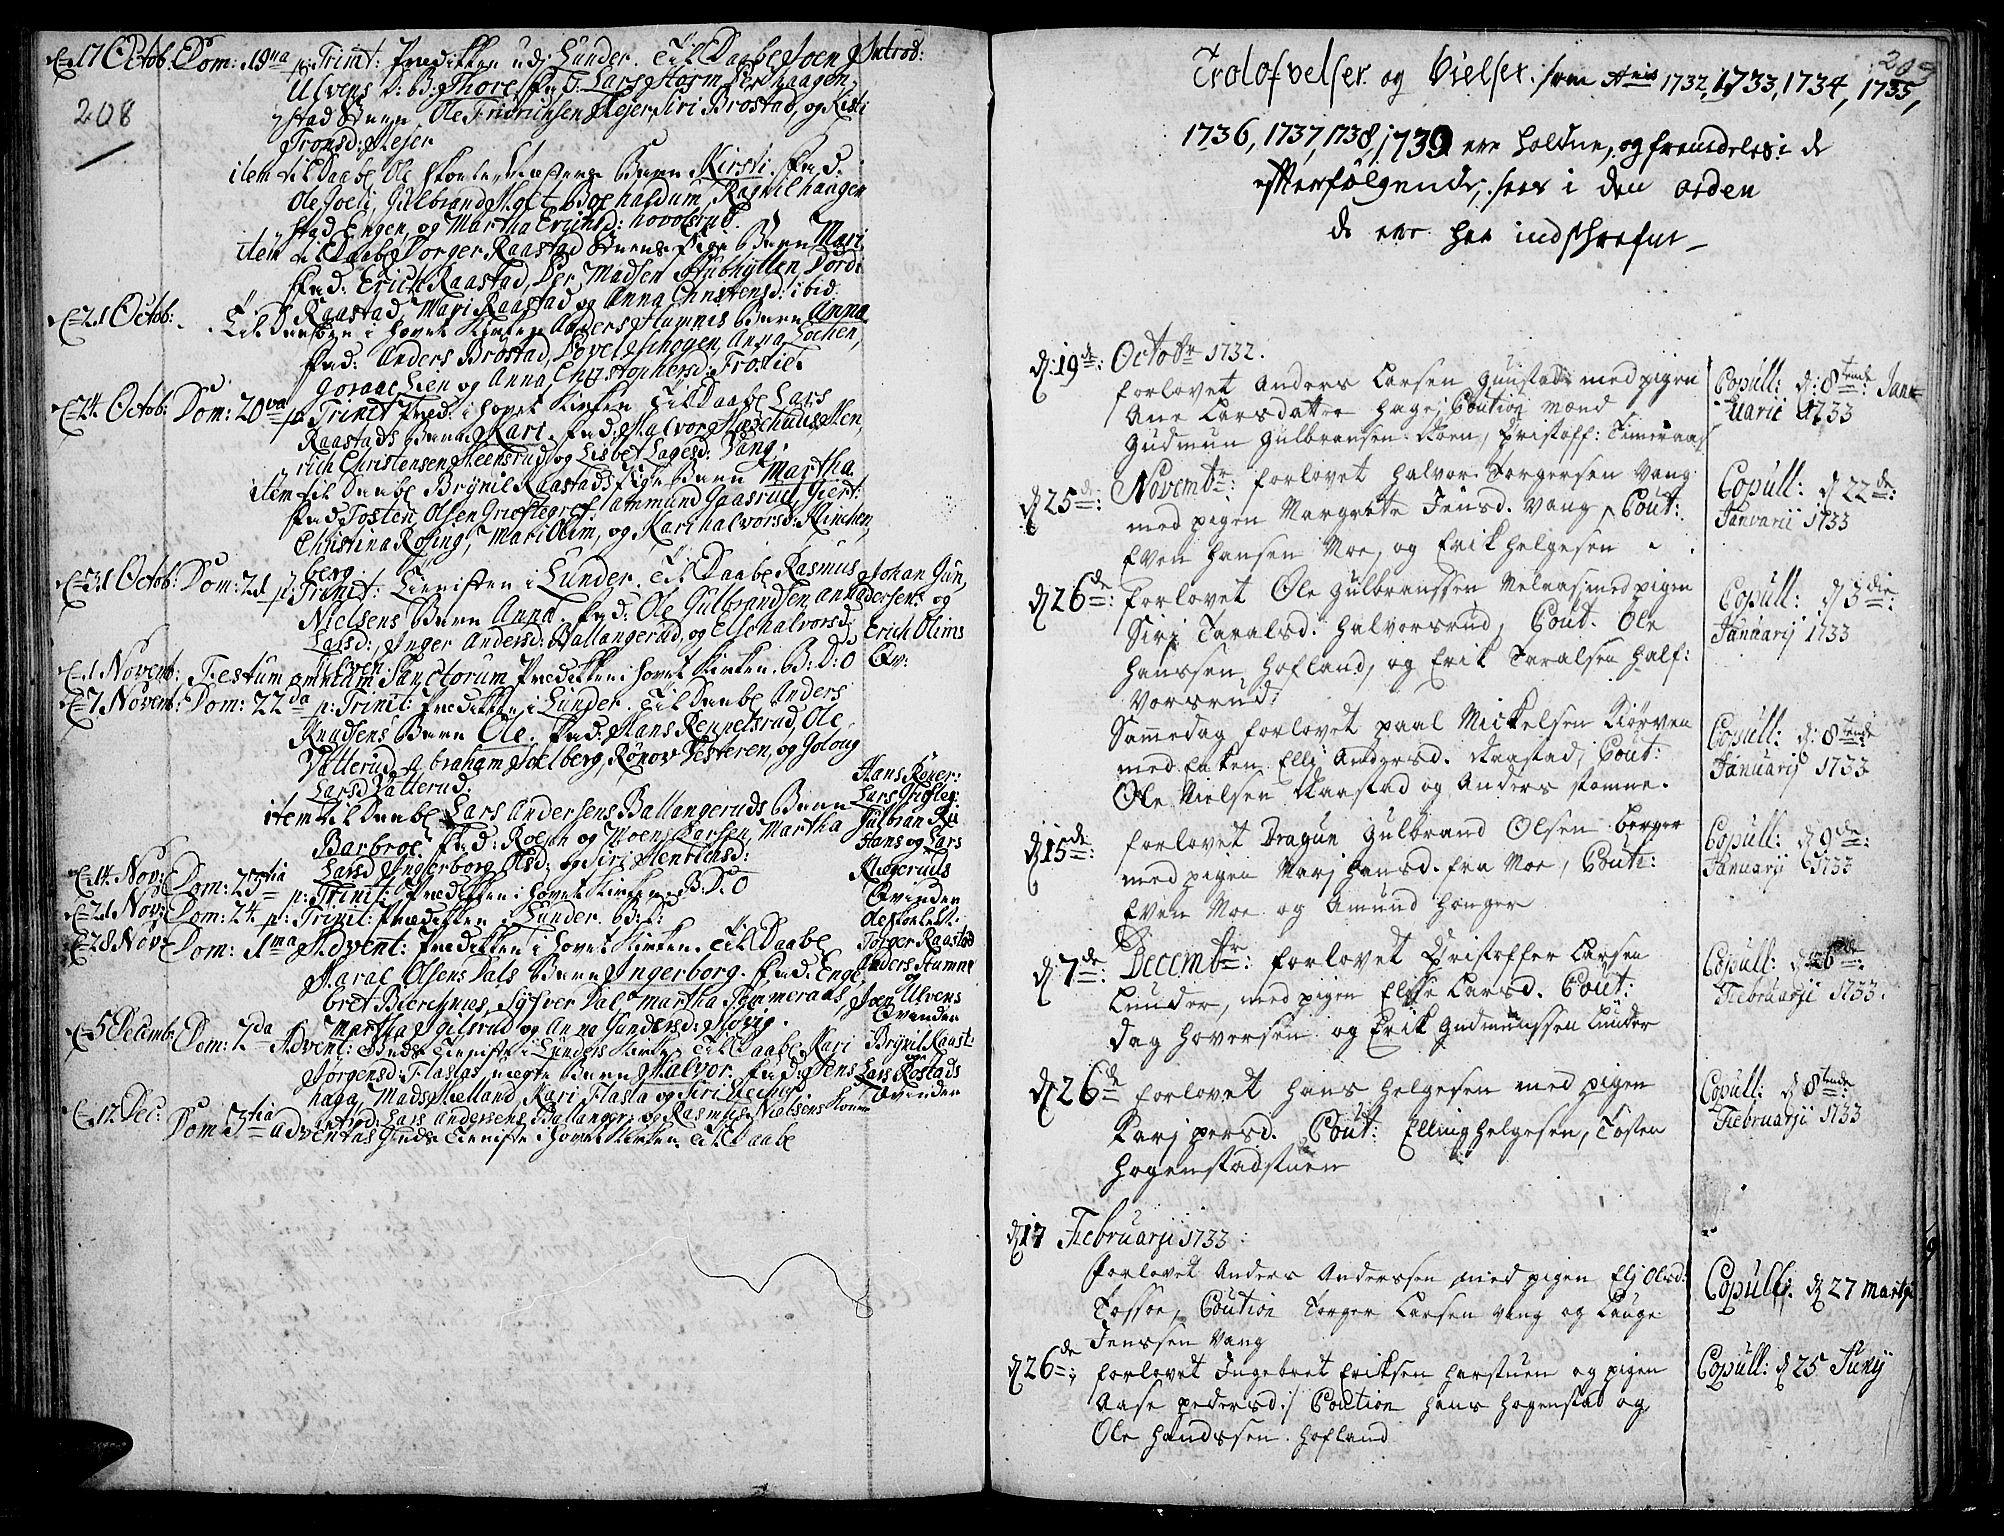 SAH, Jevnaker prestekontor, Ministerialbok nr. 2, 1725-1751, s. 208-209